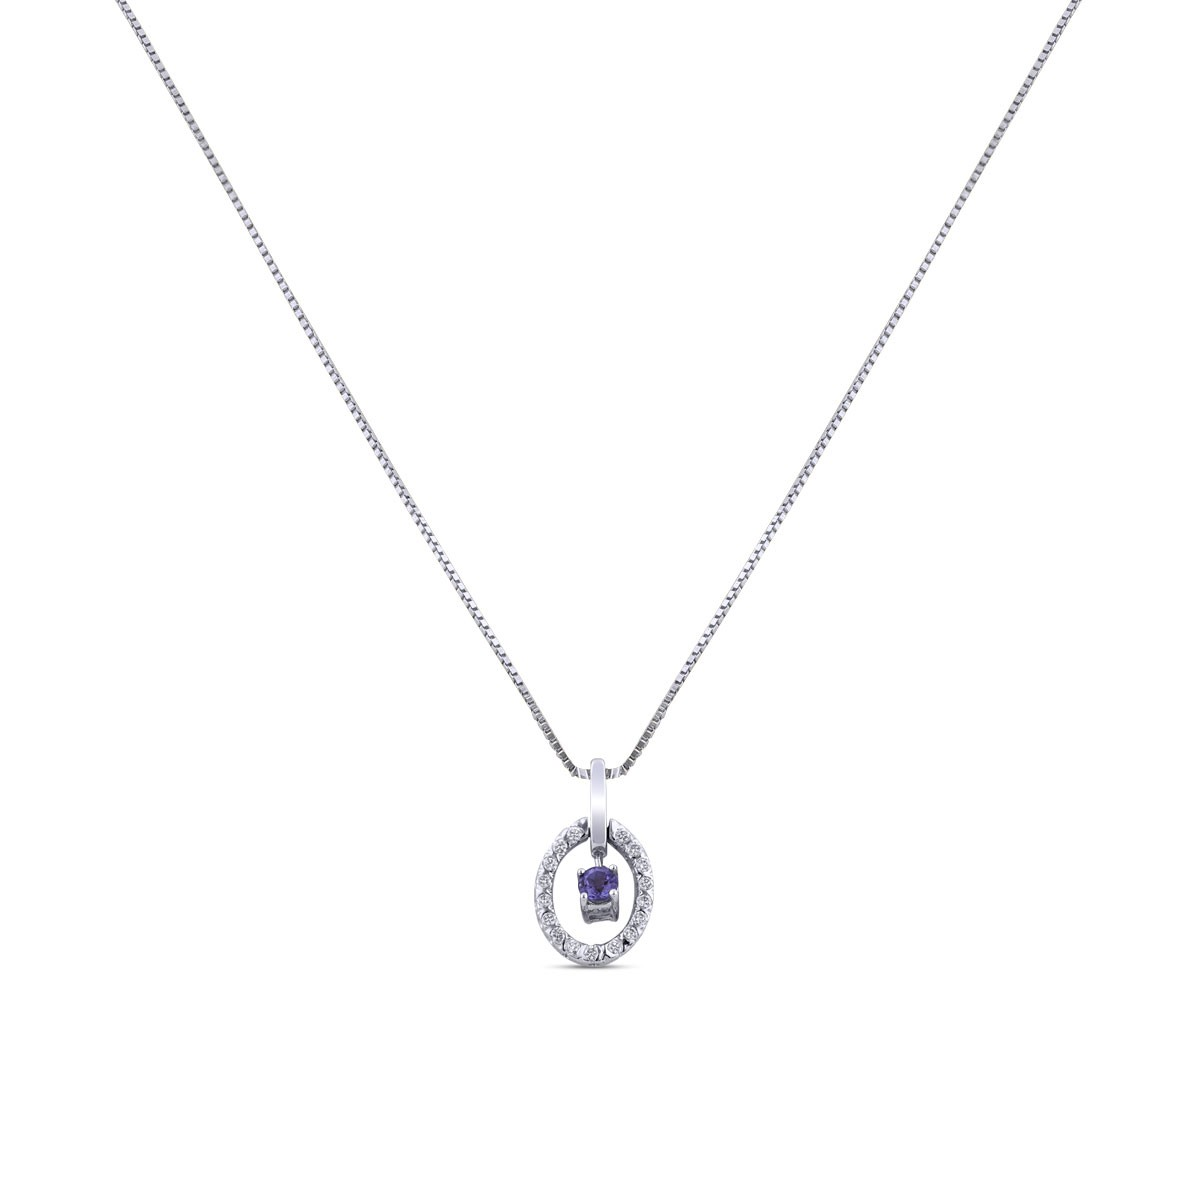 Khloe Diamond Pendant with Chain